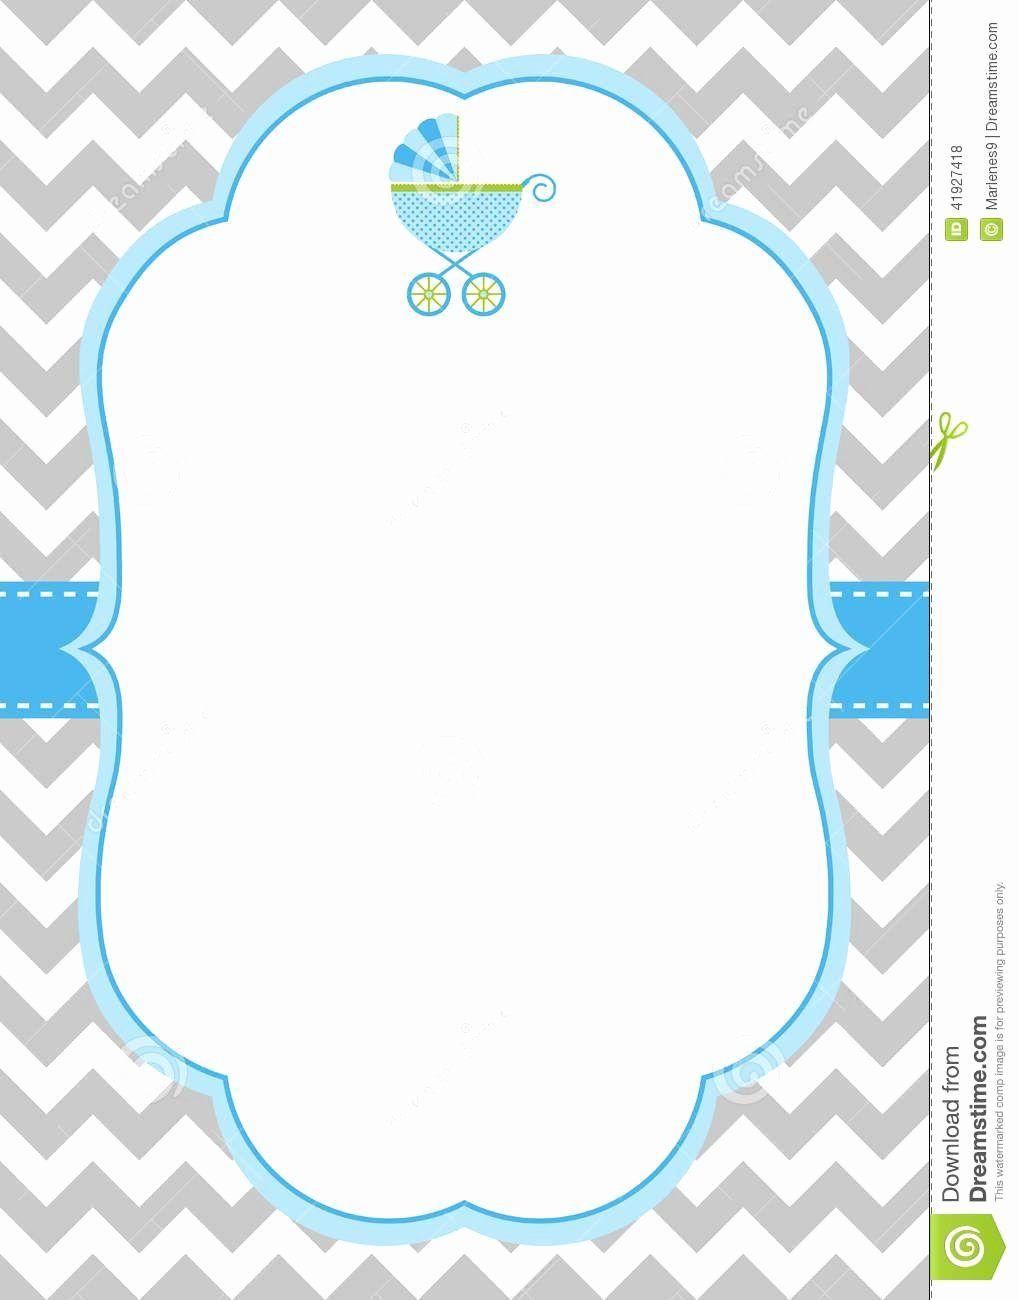 Downloadable Baby Shower Invitation Templates Luxury Template Invitation Spa Bir Free Baby Shower Invitations Baby Shower Invitation Cards Baby Boy Invitations